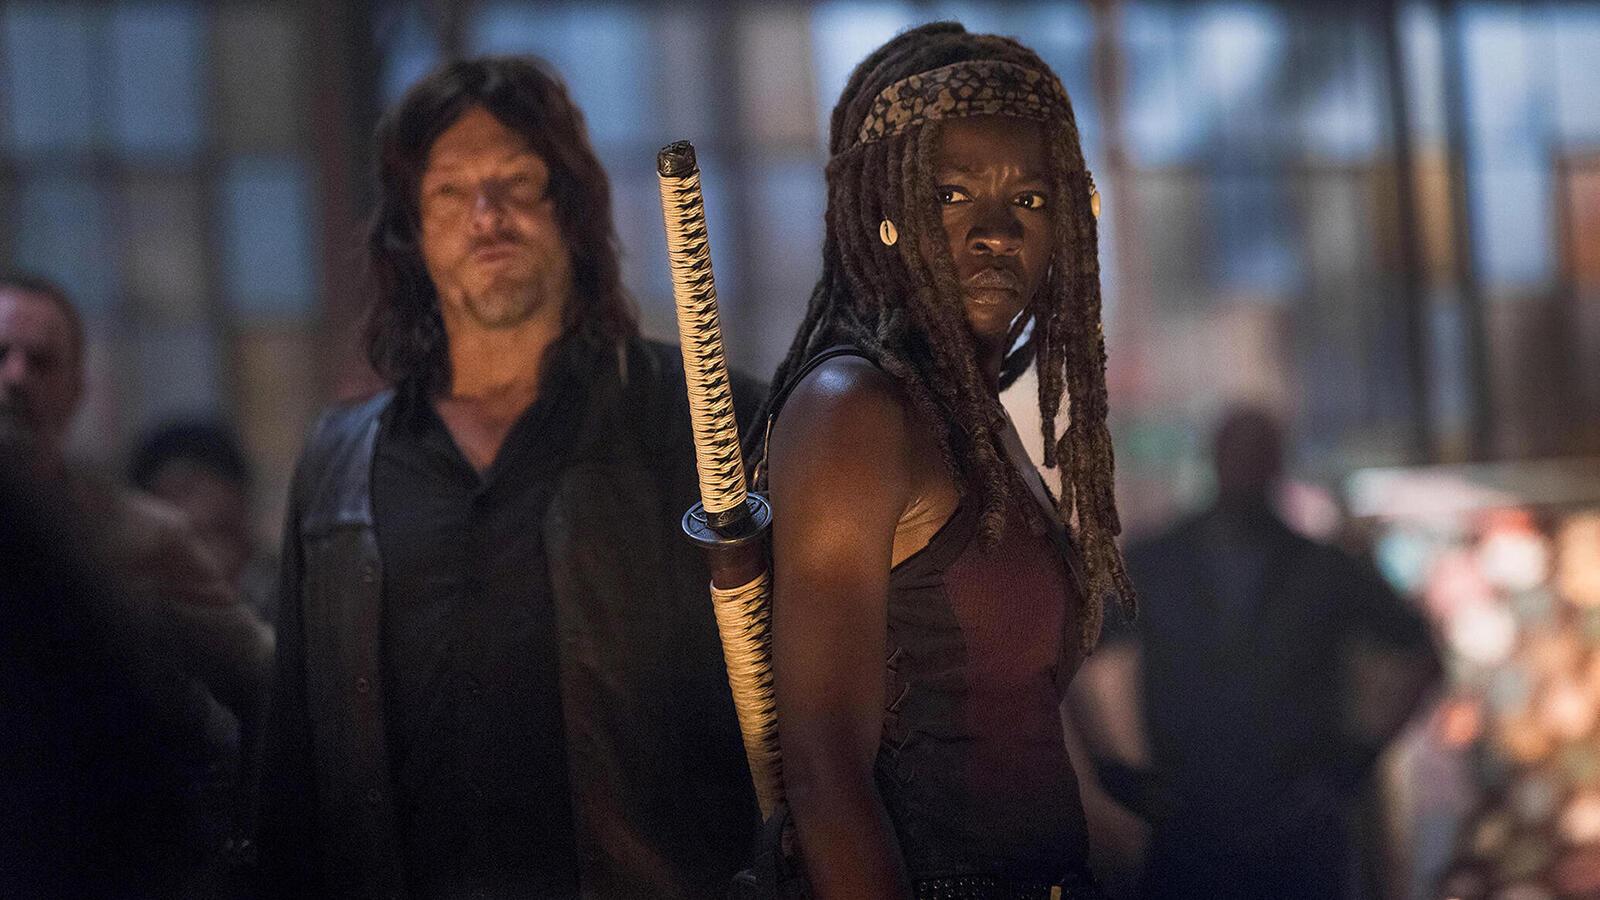 Norman Reedus and Danai Gurira, The Walking Dead